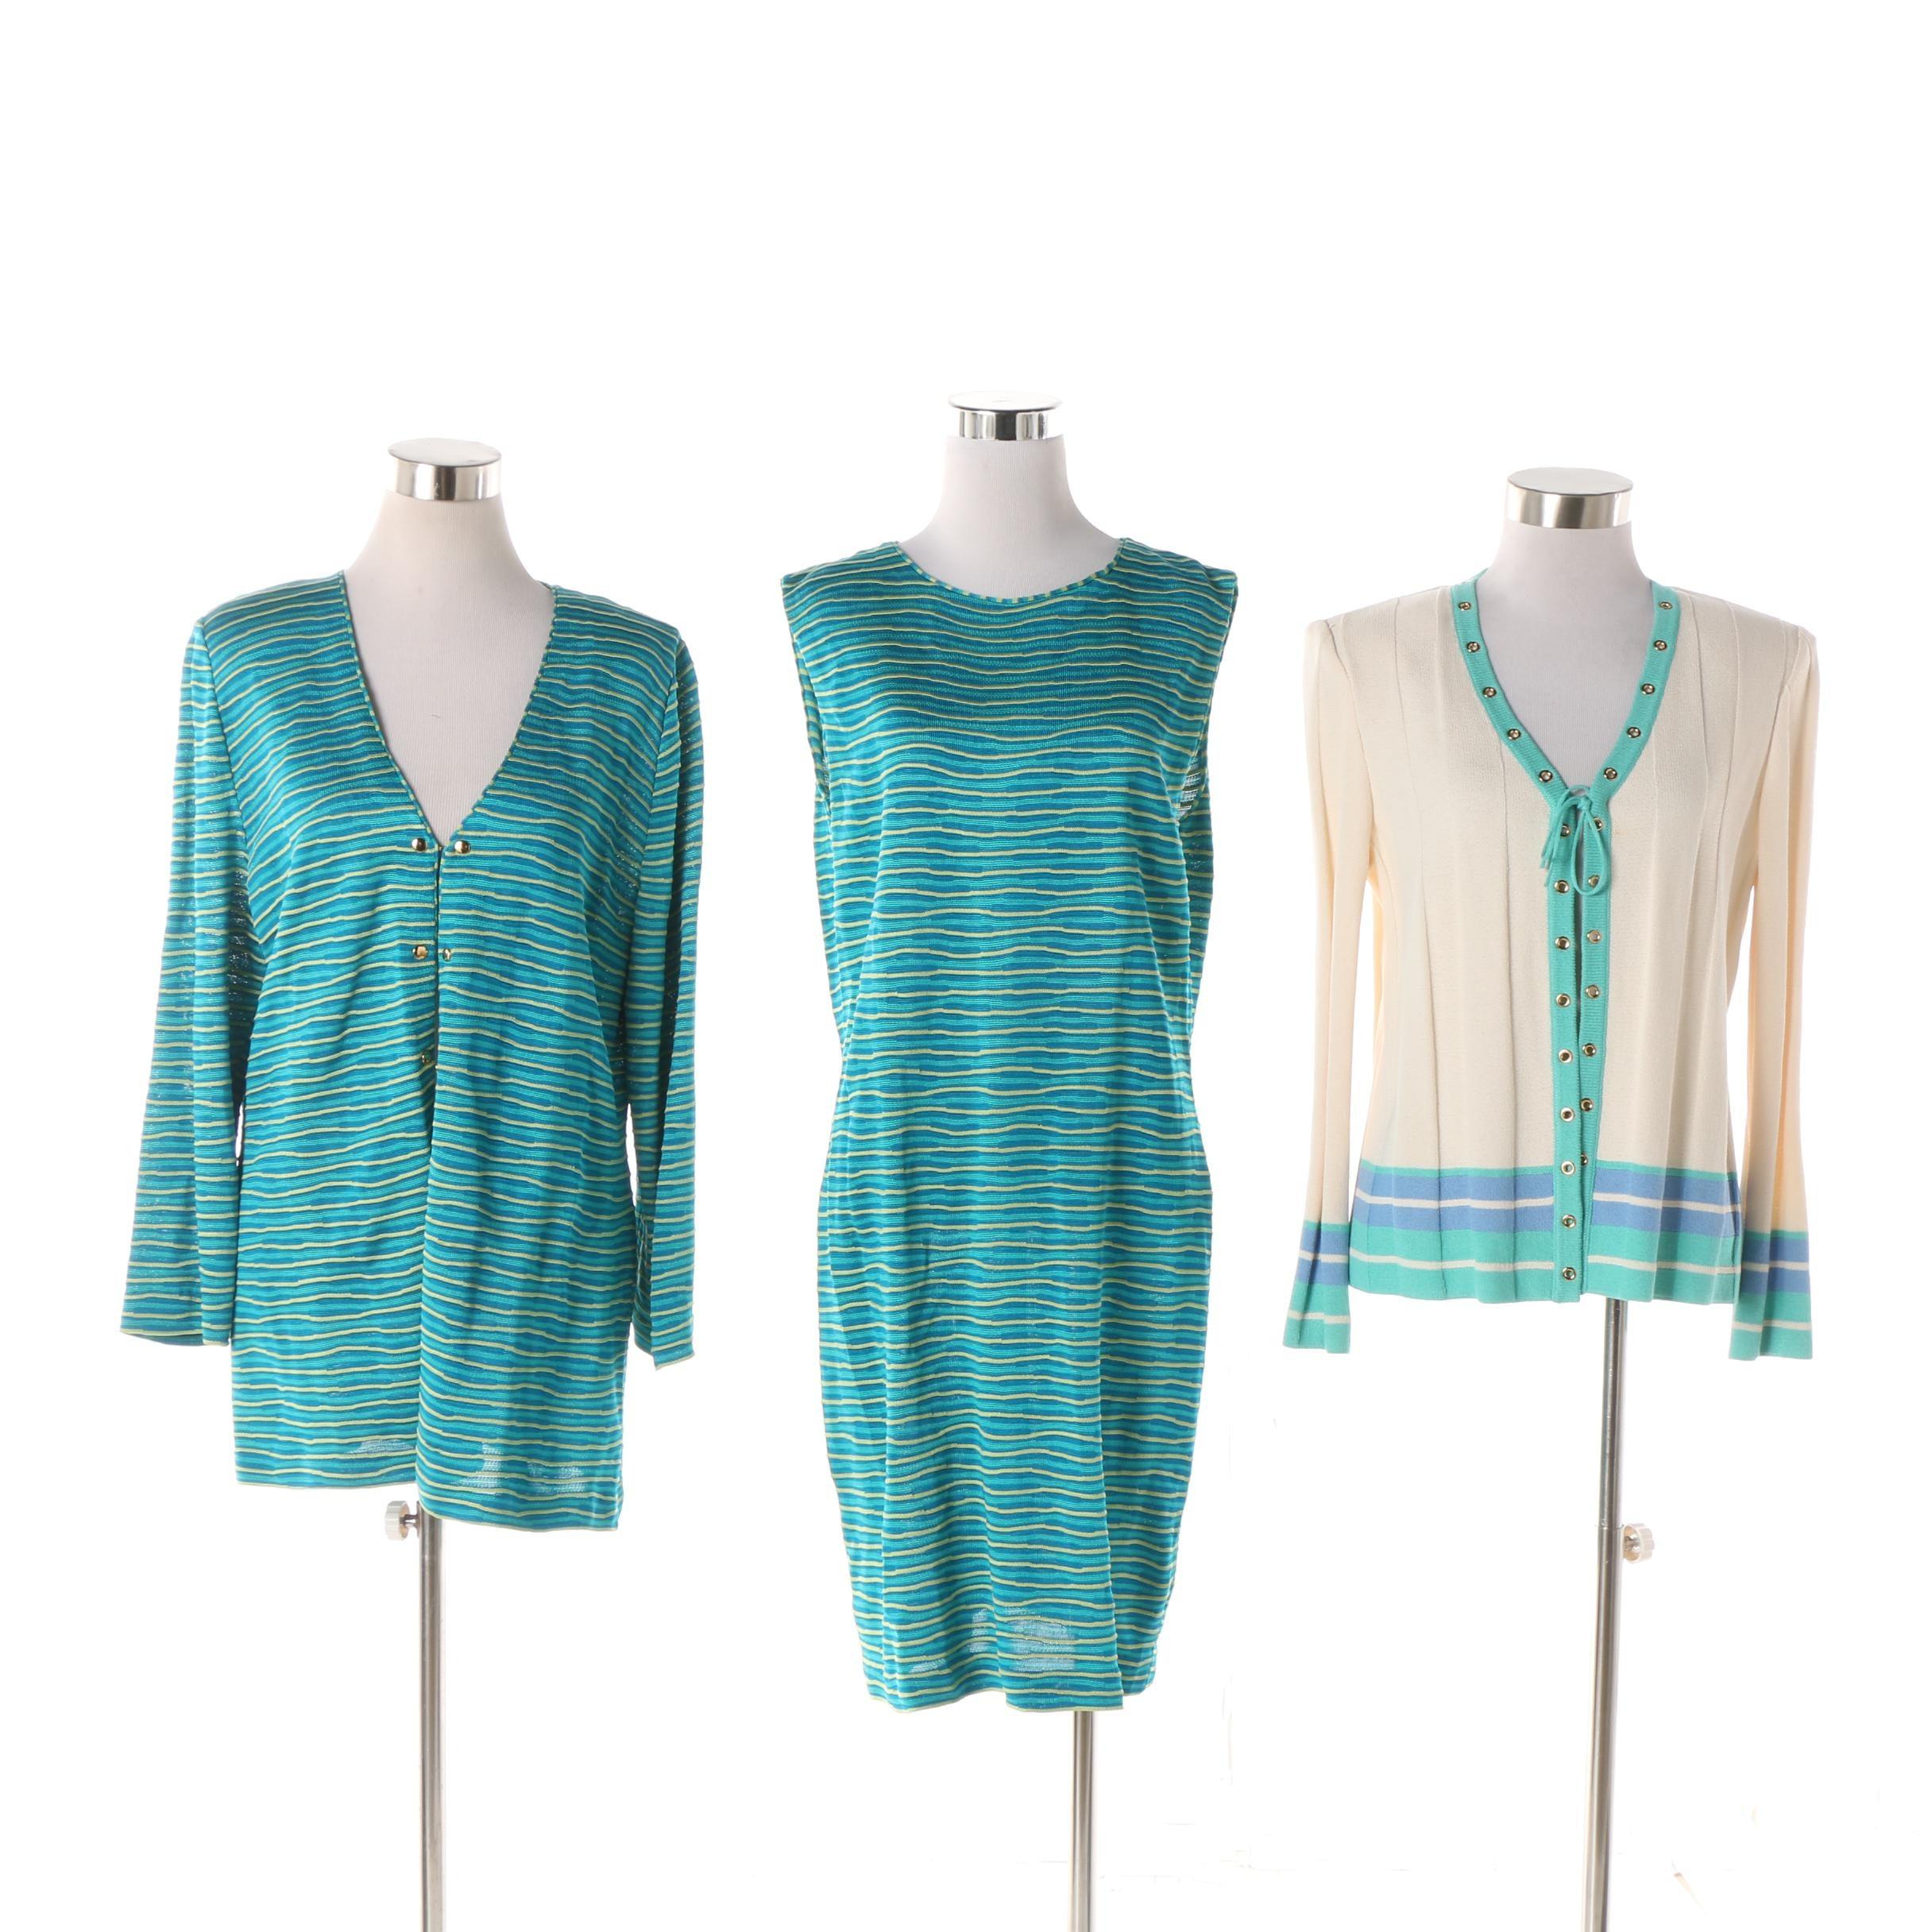 St. John Collection Knit Dress Set and St. John Sport Cardigan